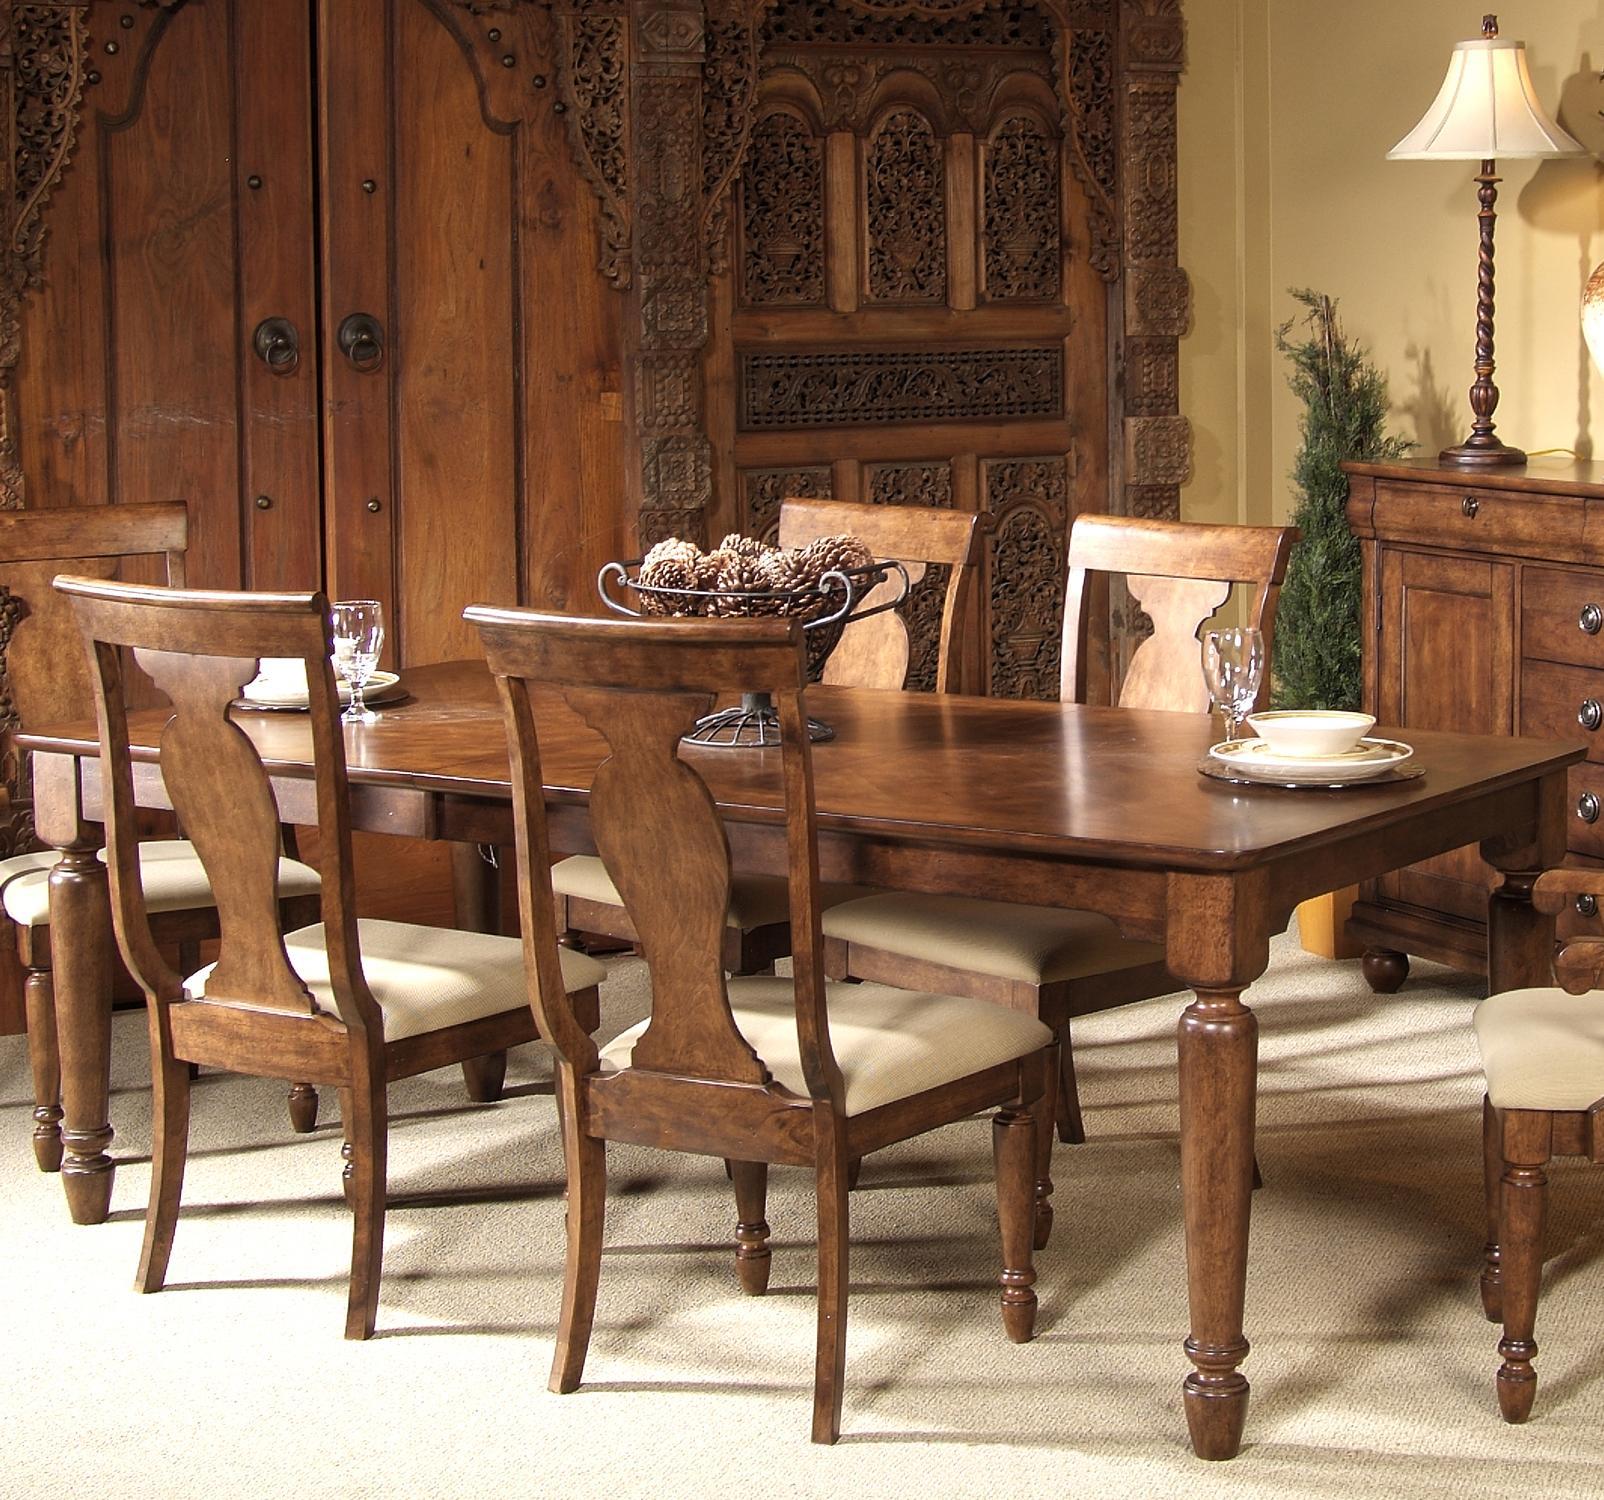 Liberty furniture rustic traditions rectangular leg table item number 589 t4284